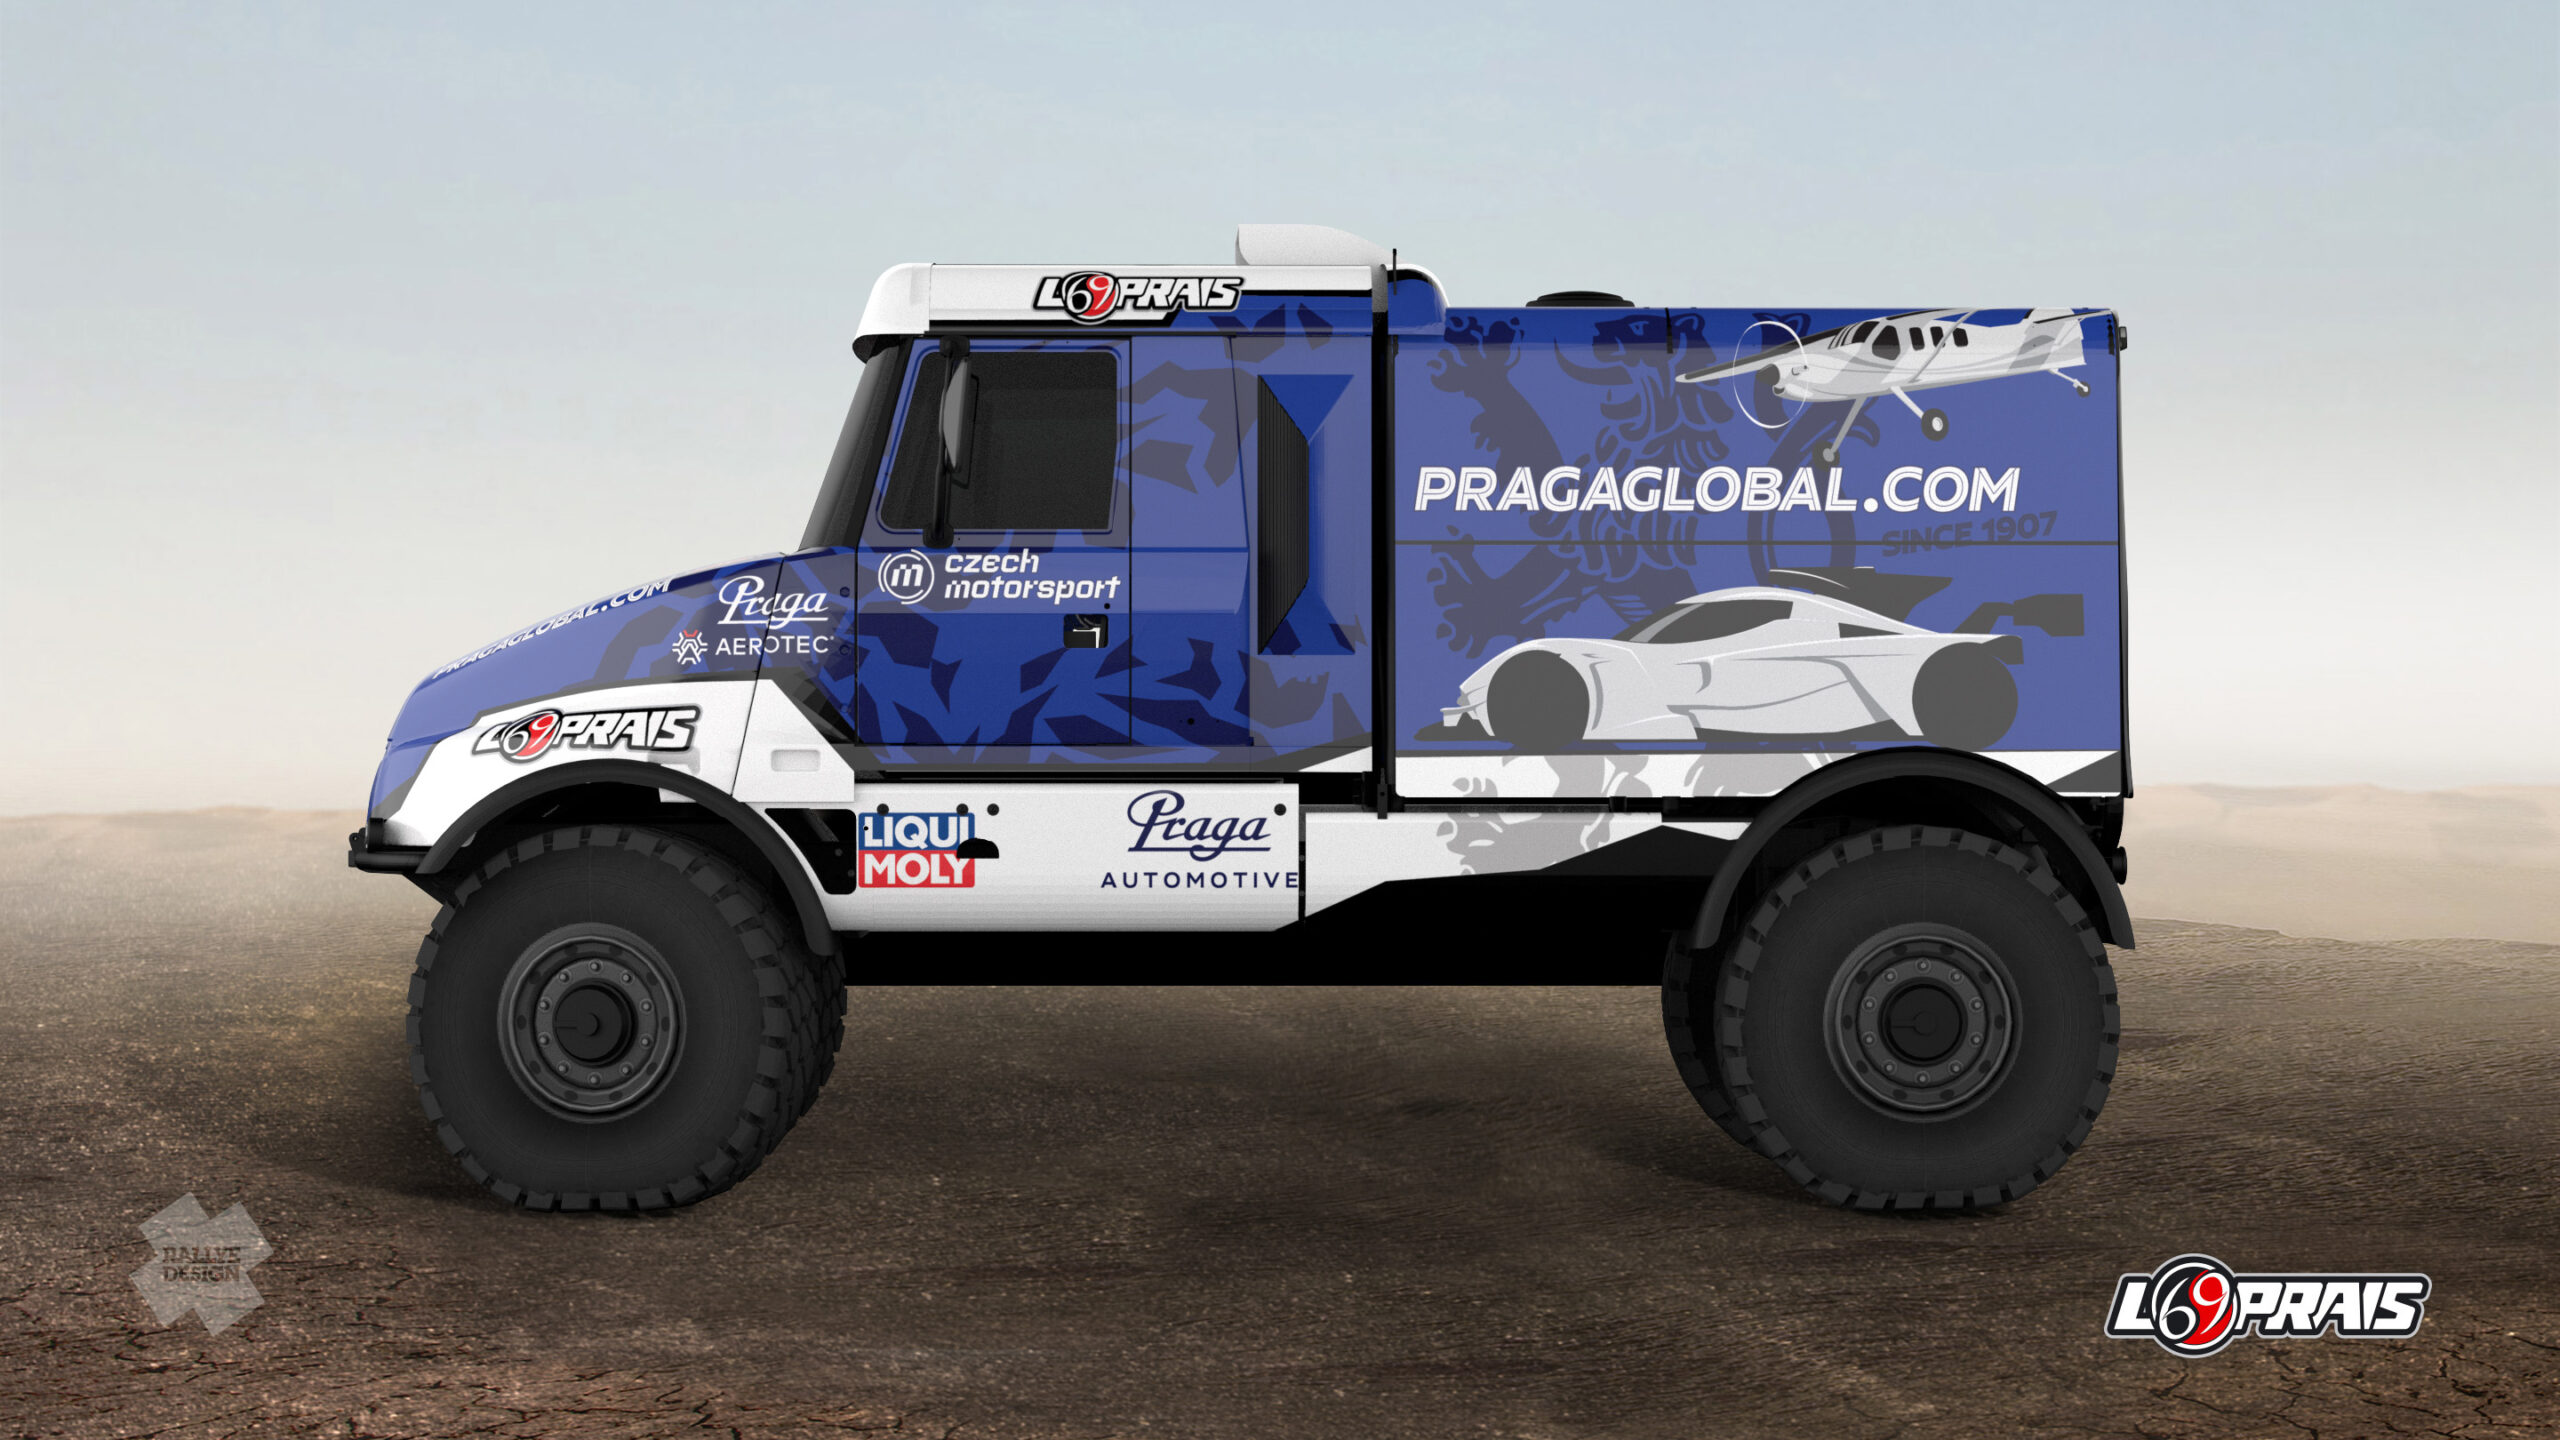 Praga | Instaforex Loprais Praga Team to race at Dakar Rally 2021 with two trucks